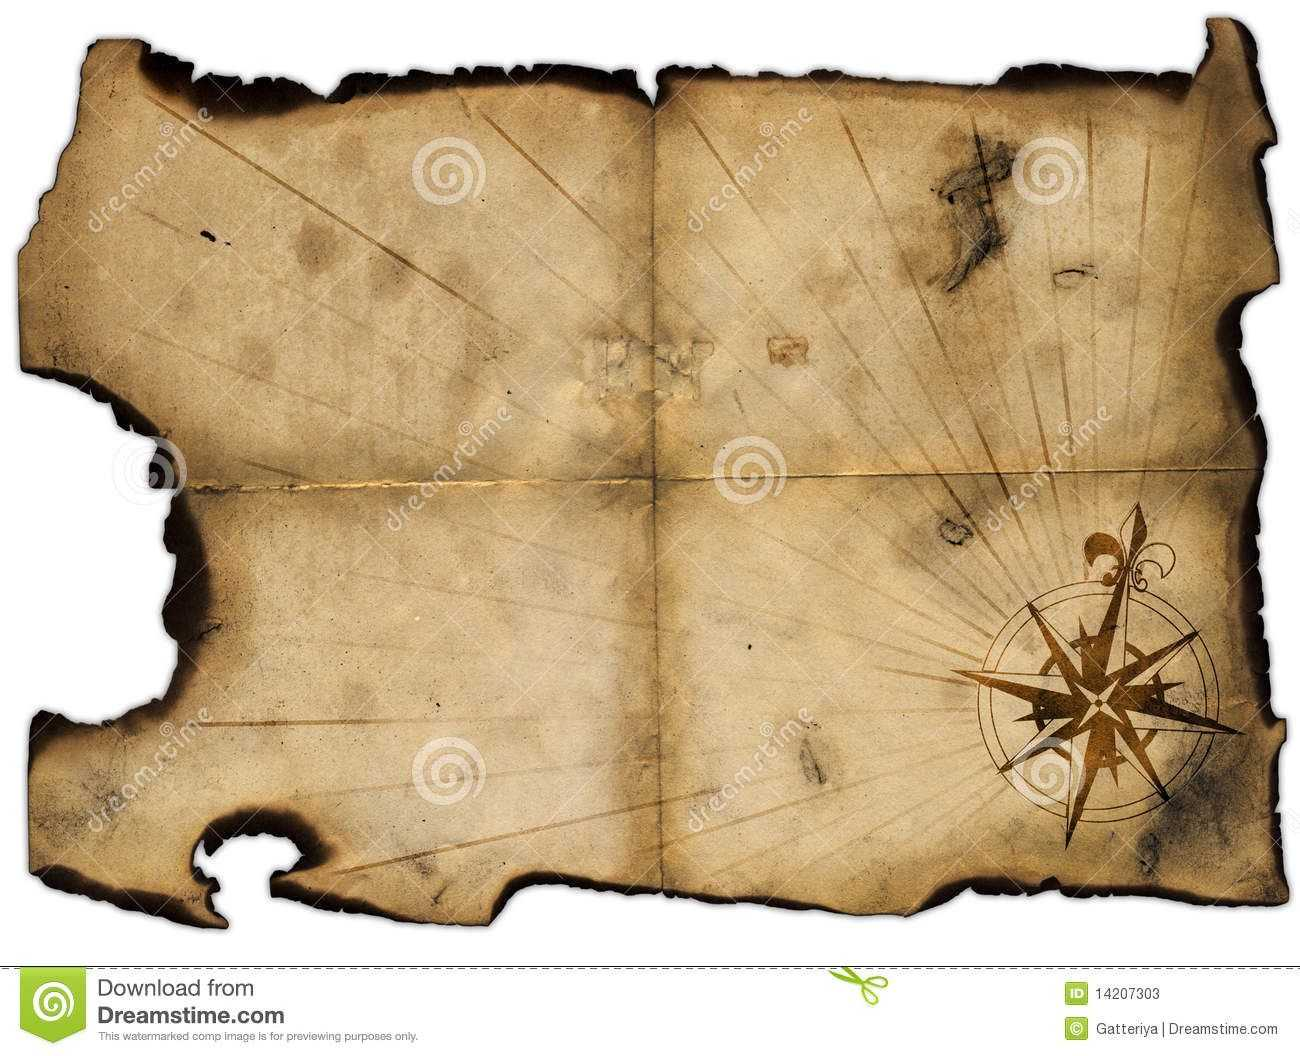 Blank Treasure Map Template - Videotekaalex.tk   Pirate Maps In Blank Pirate Map Template